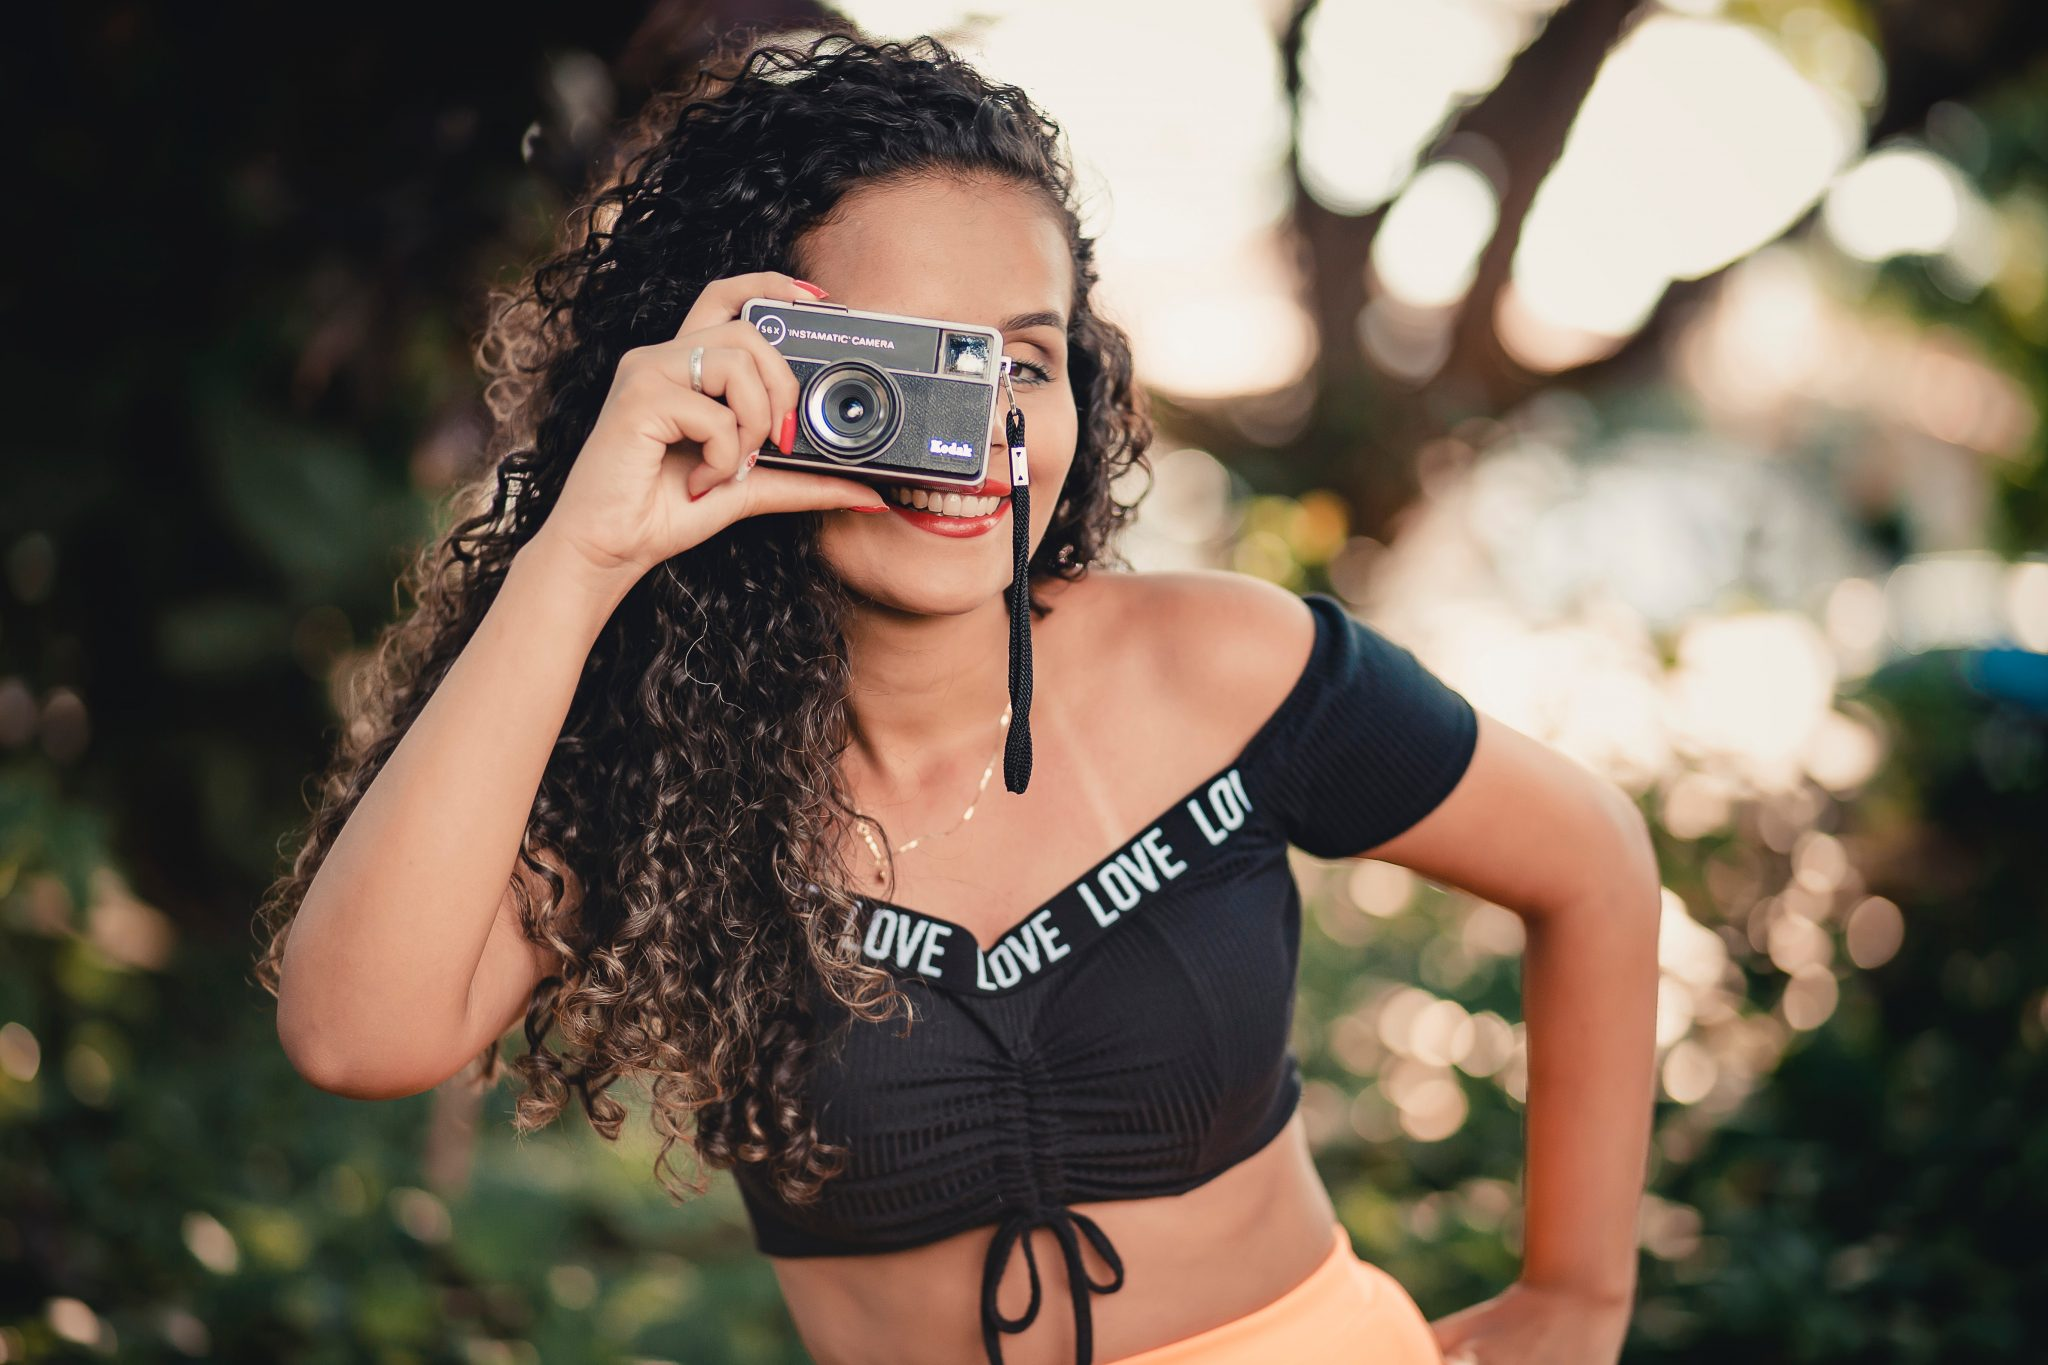 best photo editing software under $100